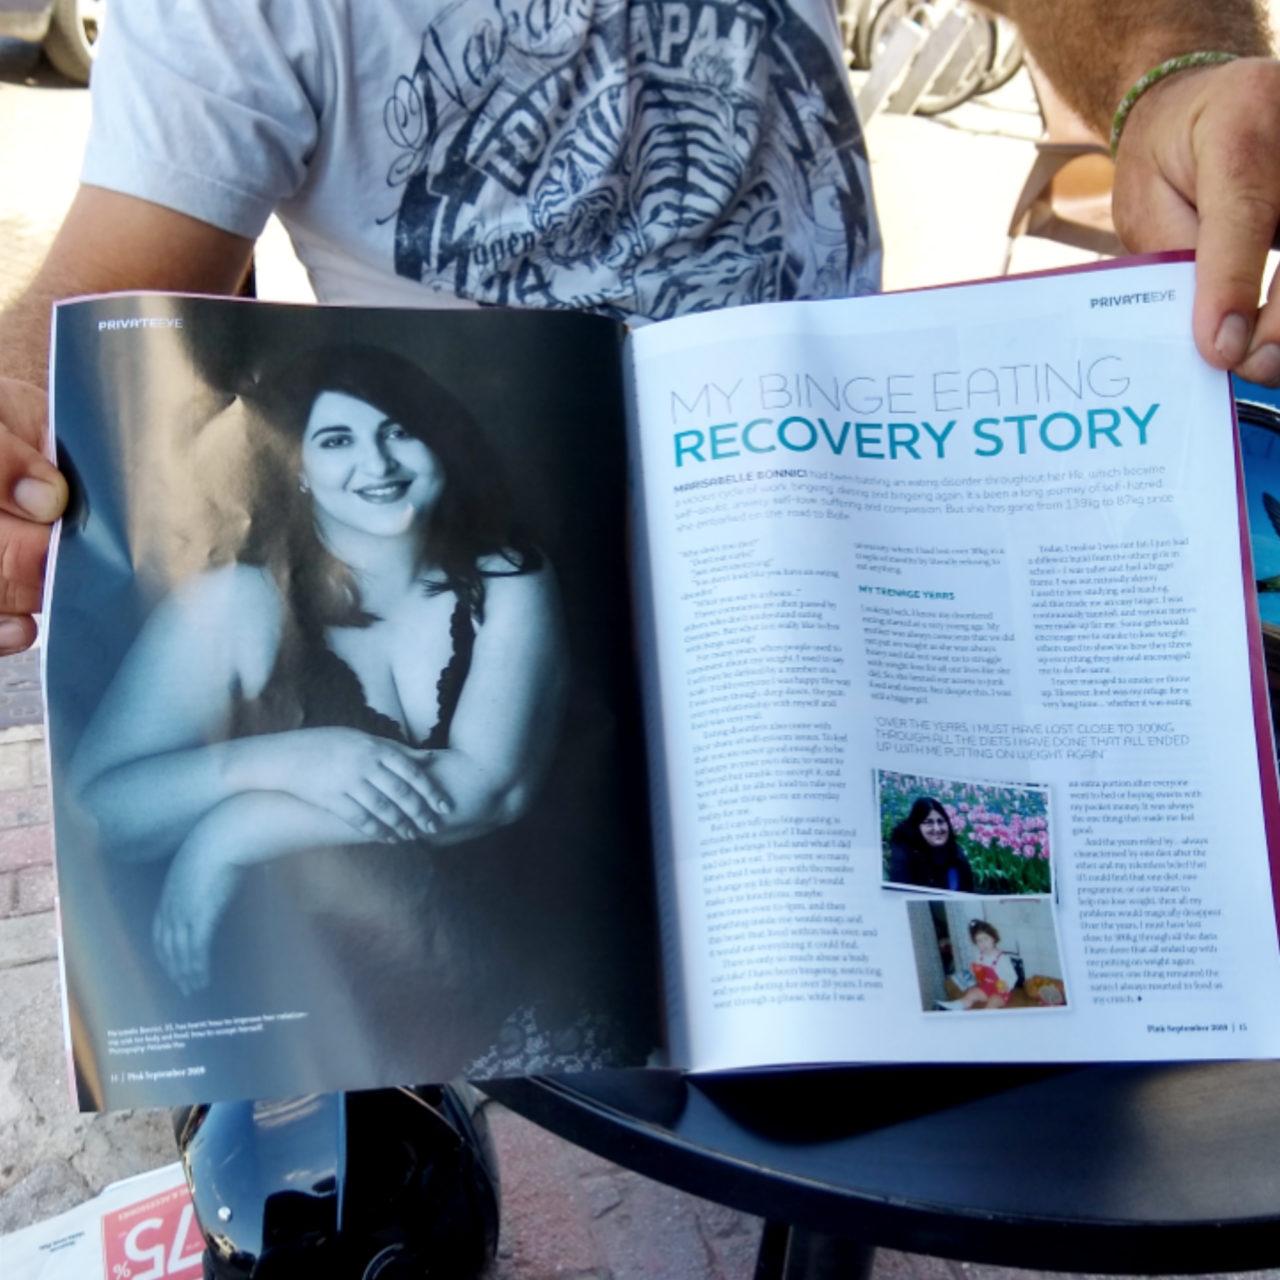 Publication & Awards  InShot_20190929_173544293-1-1280x1280 Portraits published in Pink Magazine, featuring Marisabelle Bonnici